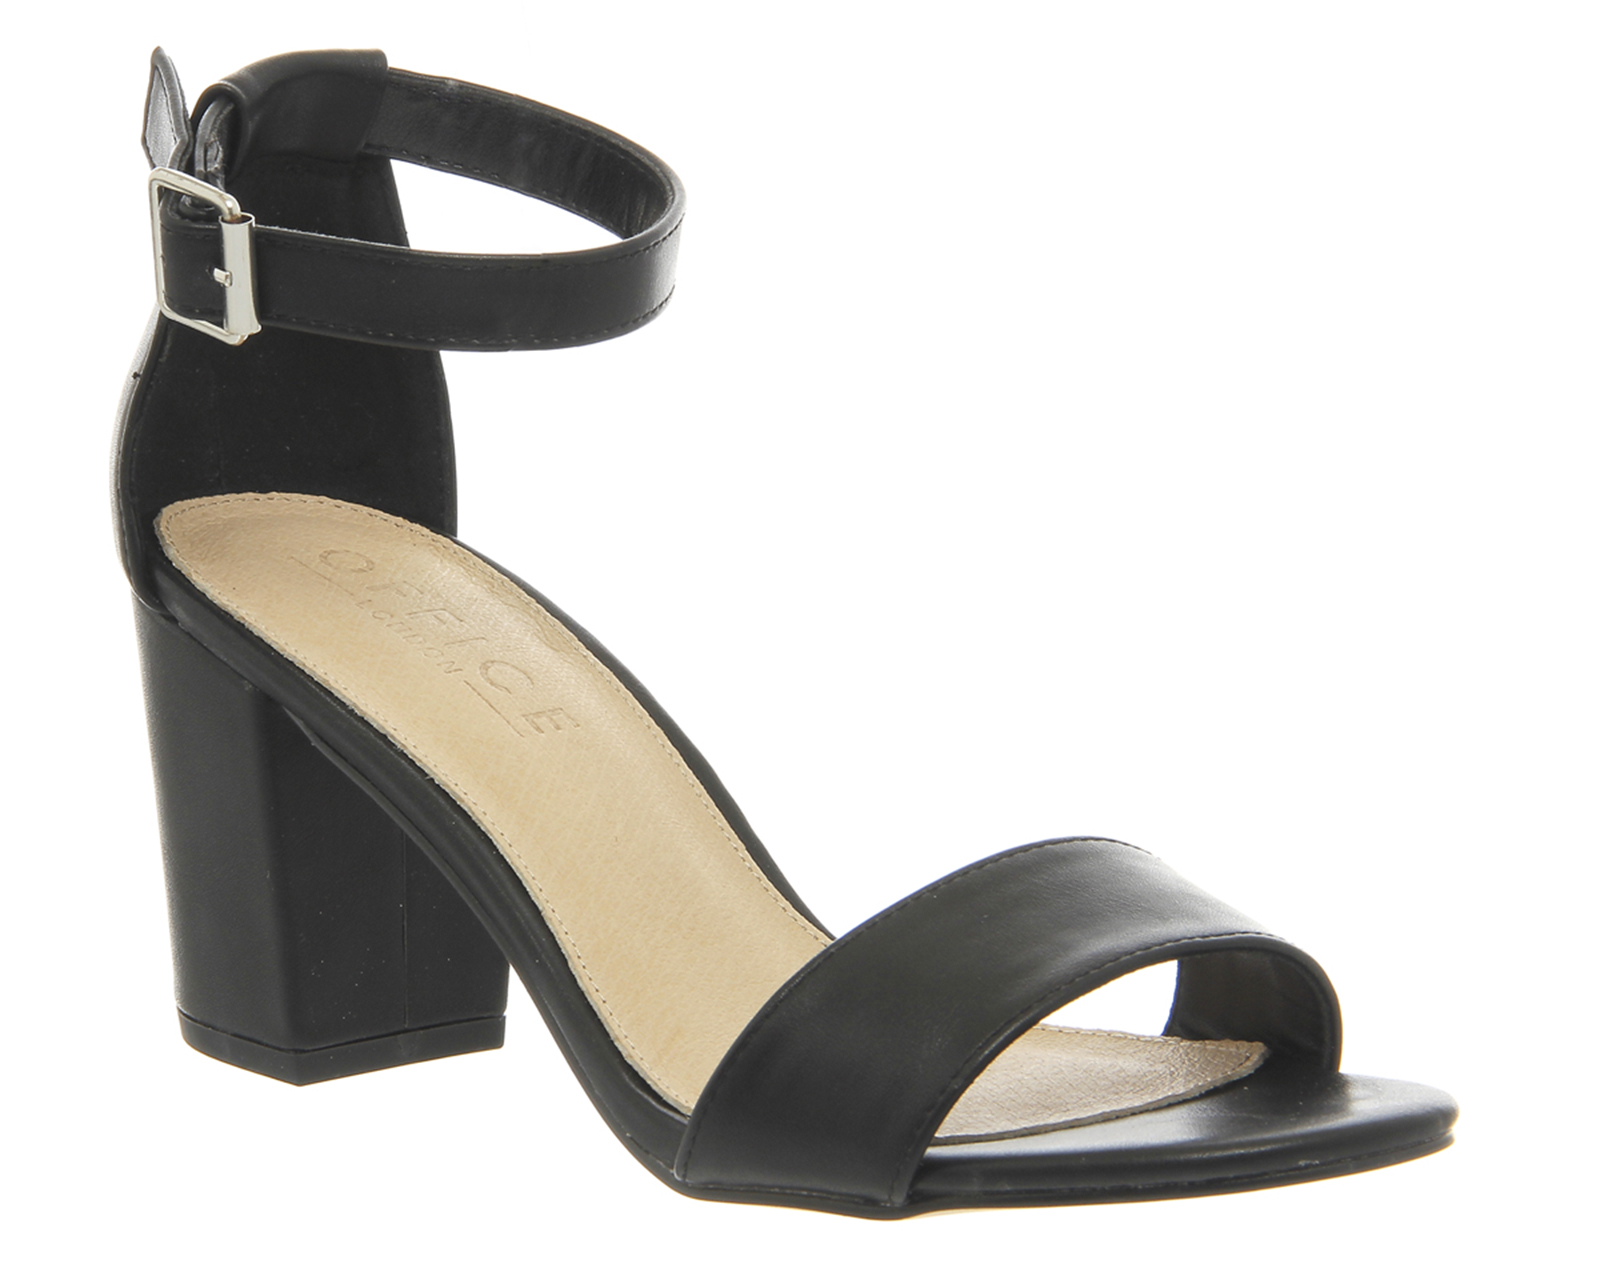 Black sandals ebay uk - Womens Office Watermelon Buckle Block Heel Sandal Black